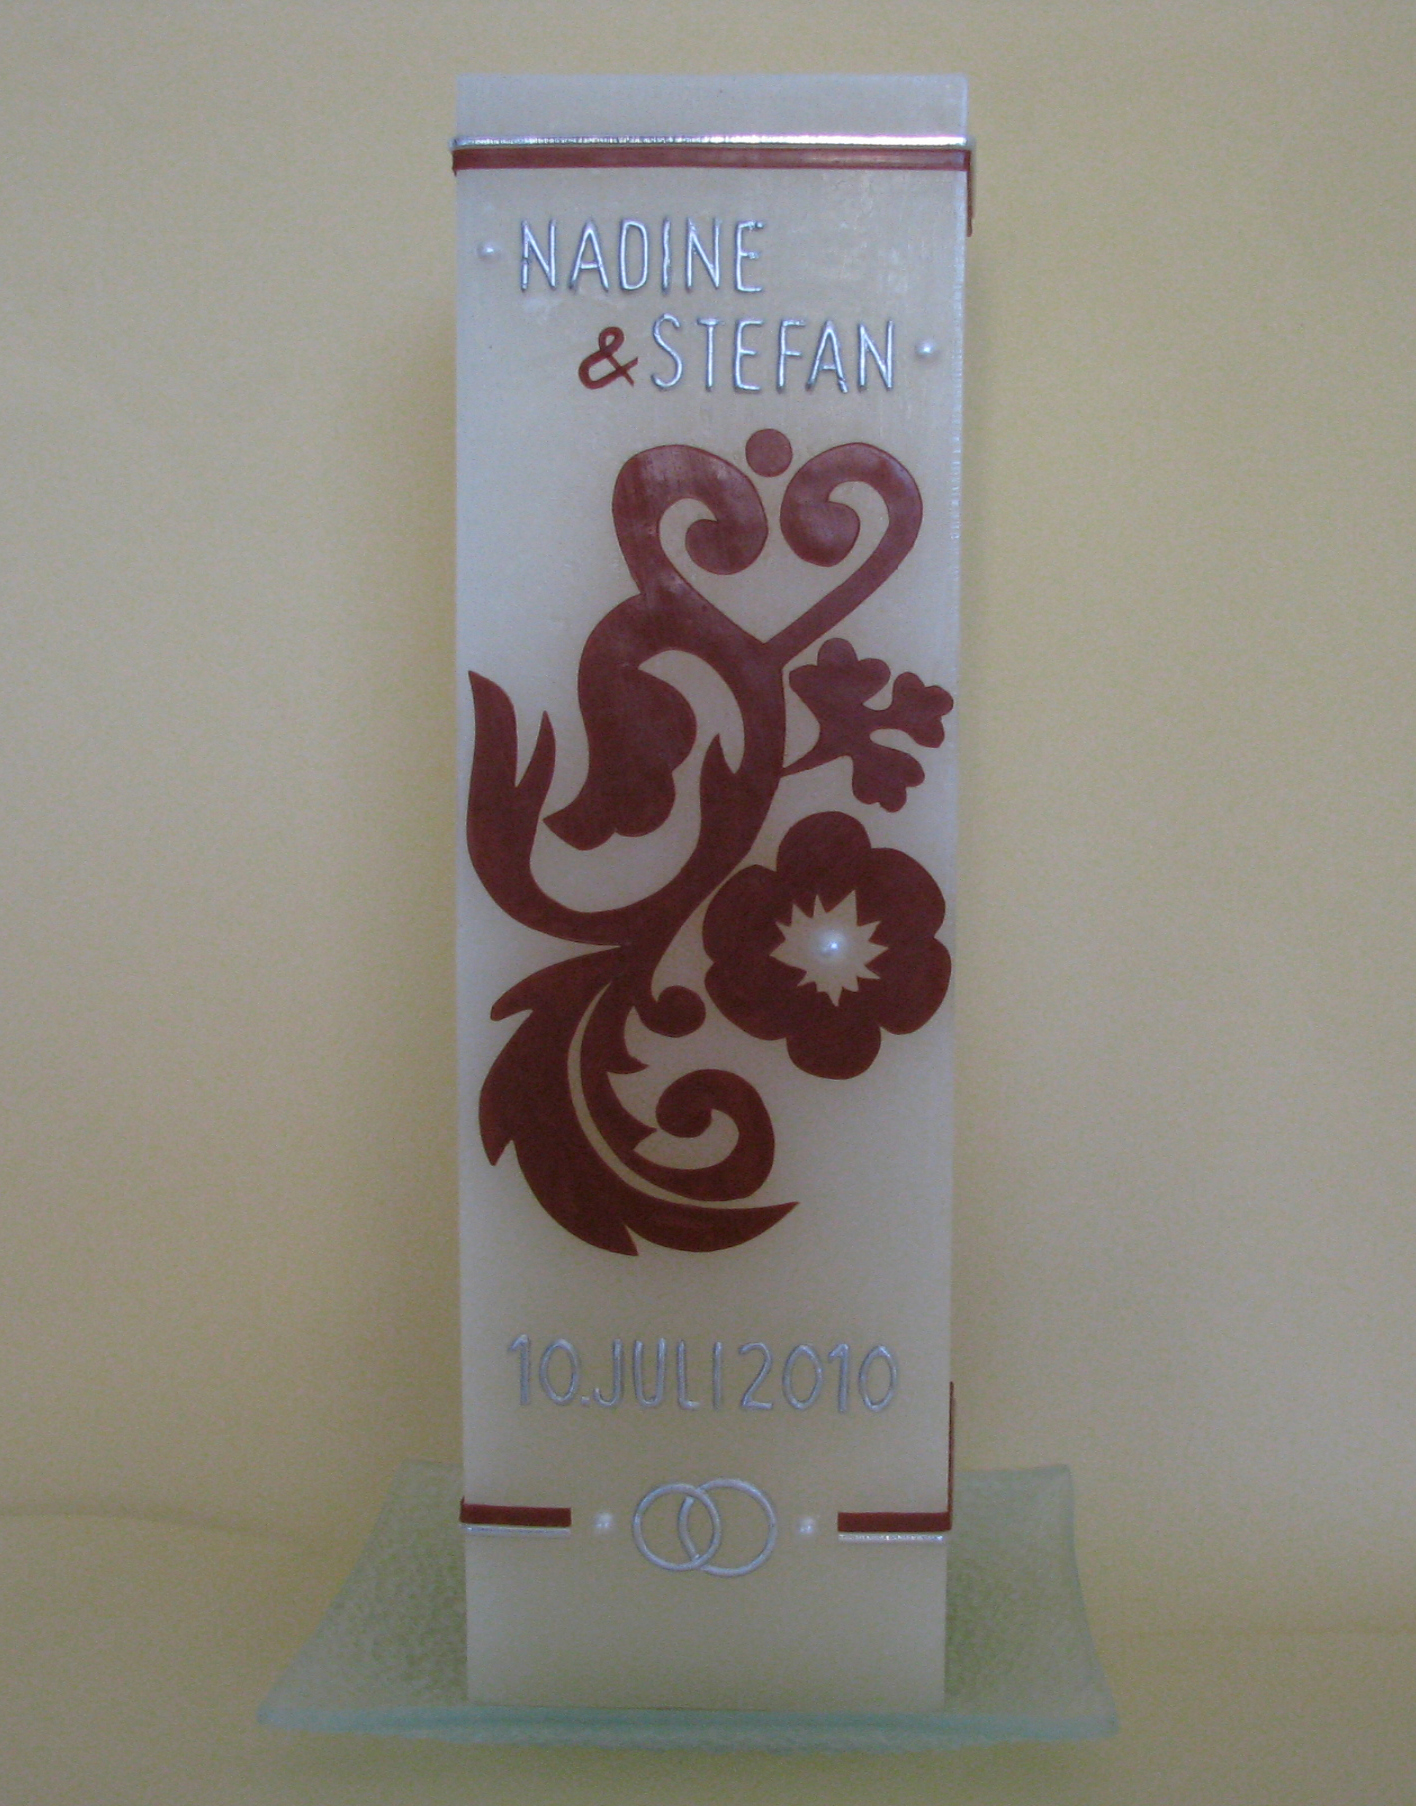 HE-0053, quadratisch, HxB ca 22 cm x 7,5 cm, Preis ca. € 34,--